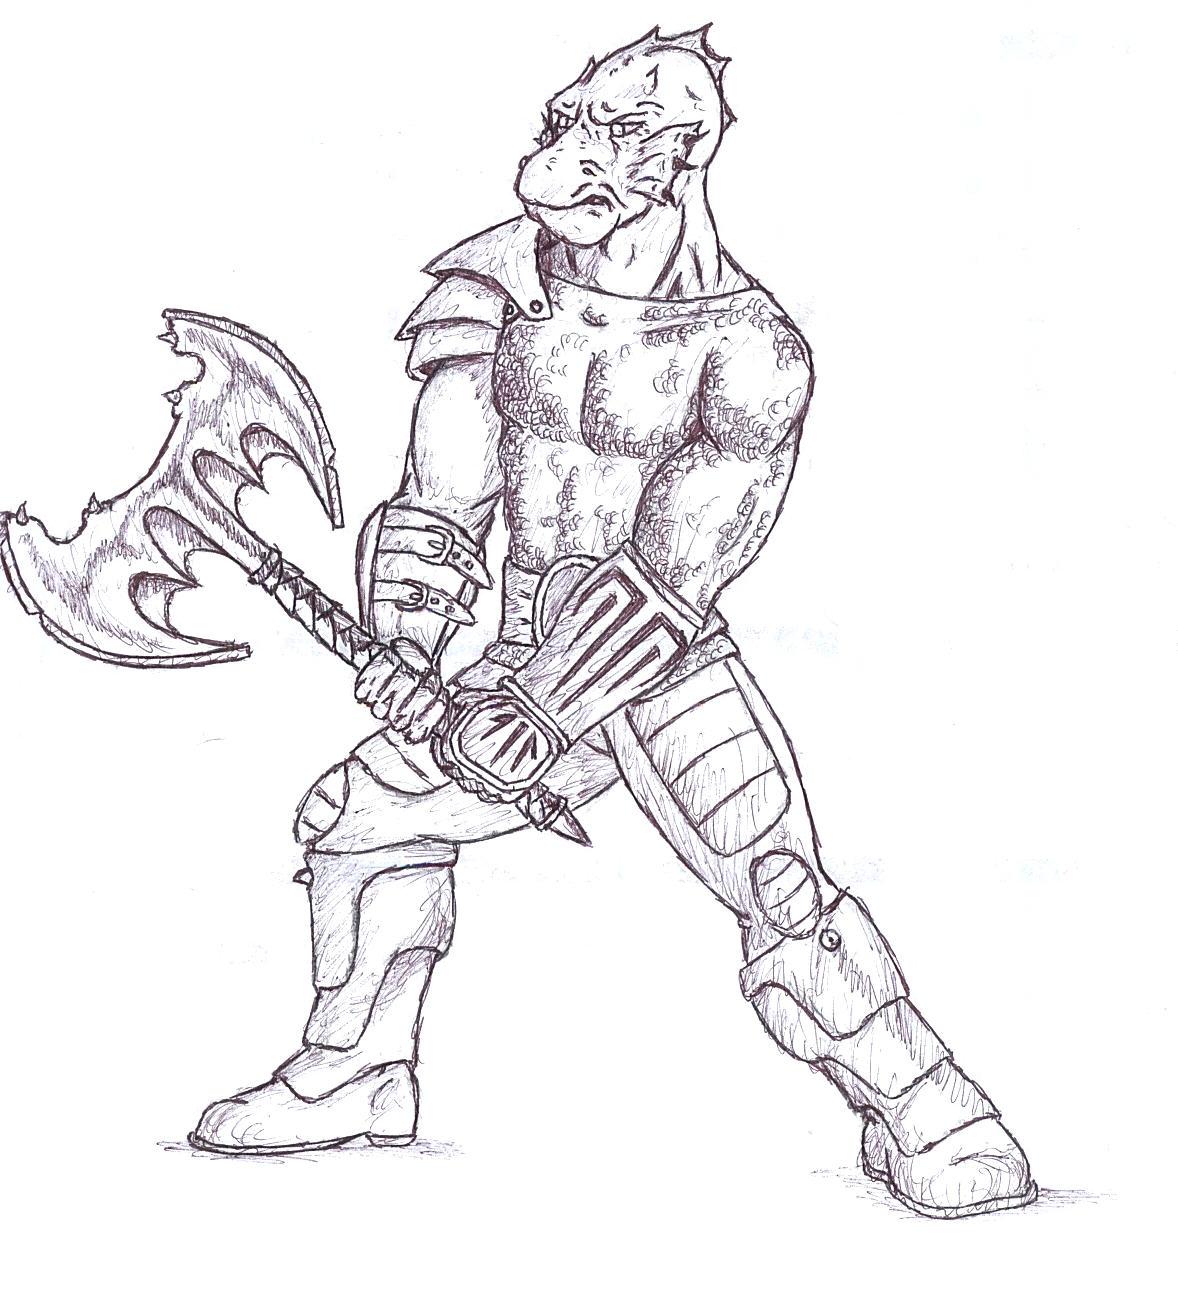 Half dragon man not trogdor by dekerlegend on deviantart half dragon man not trogdor by dekerlegend ccuart Images